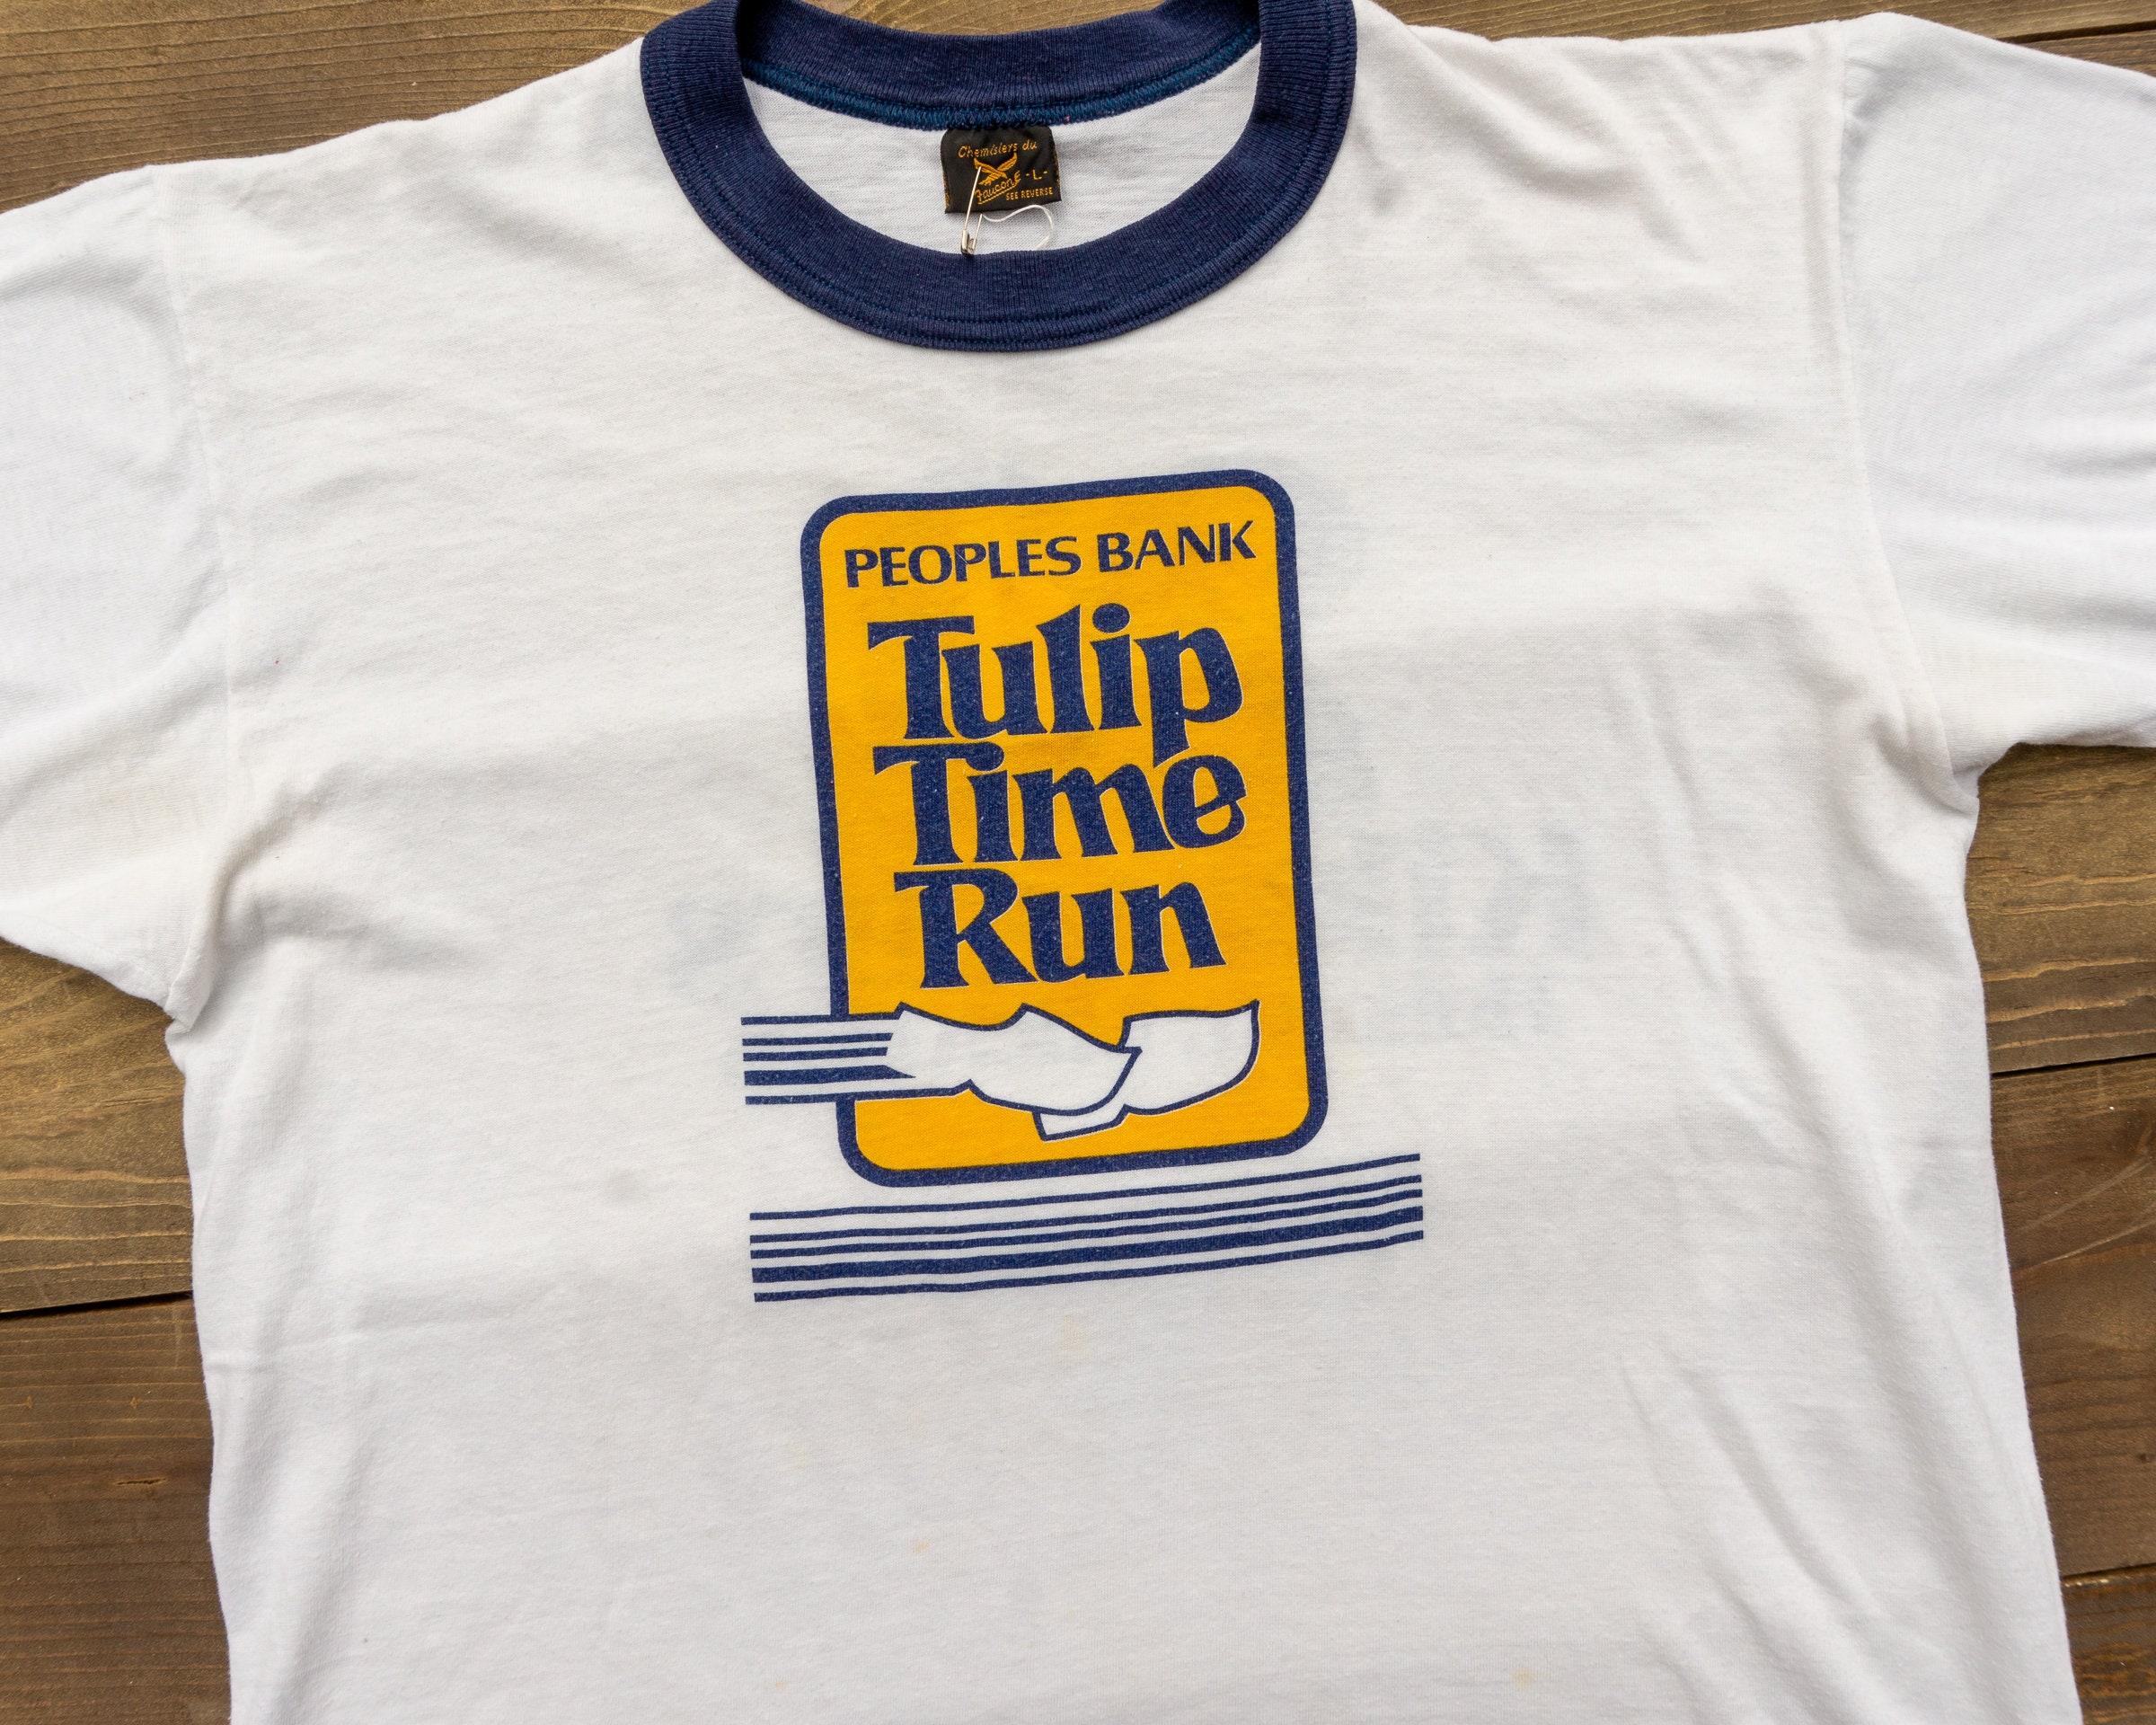 80s Tops, Shirts, T-shirts, Blouse   90s T-shirts 80S Ringer Tee Marathon Race Tulip Time Run $34.00 AT vintagedancer.com